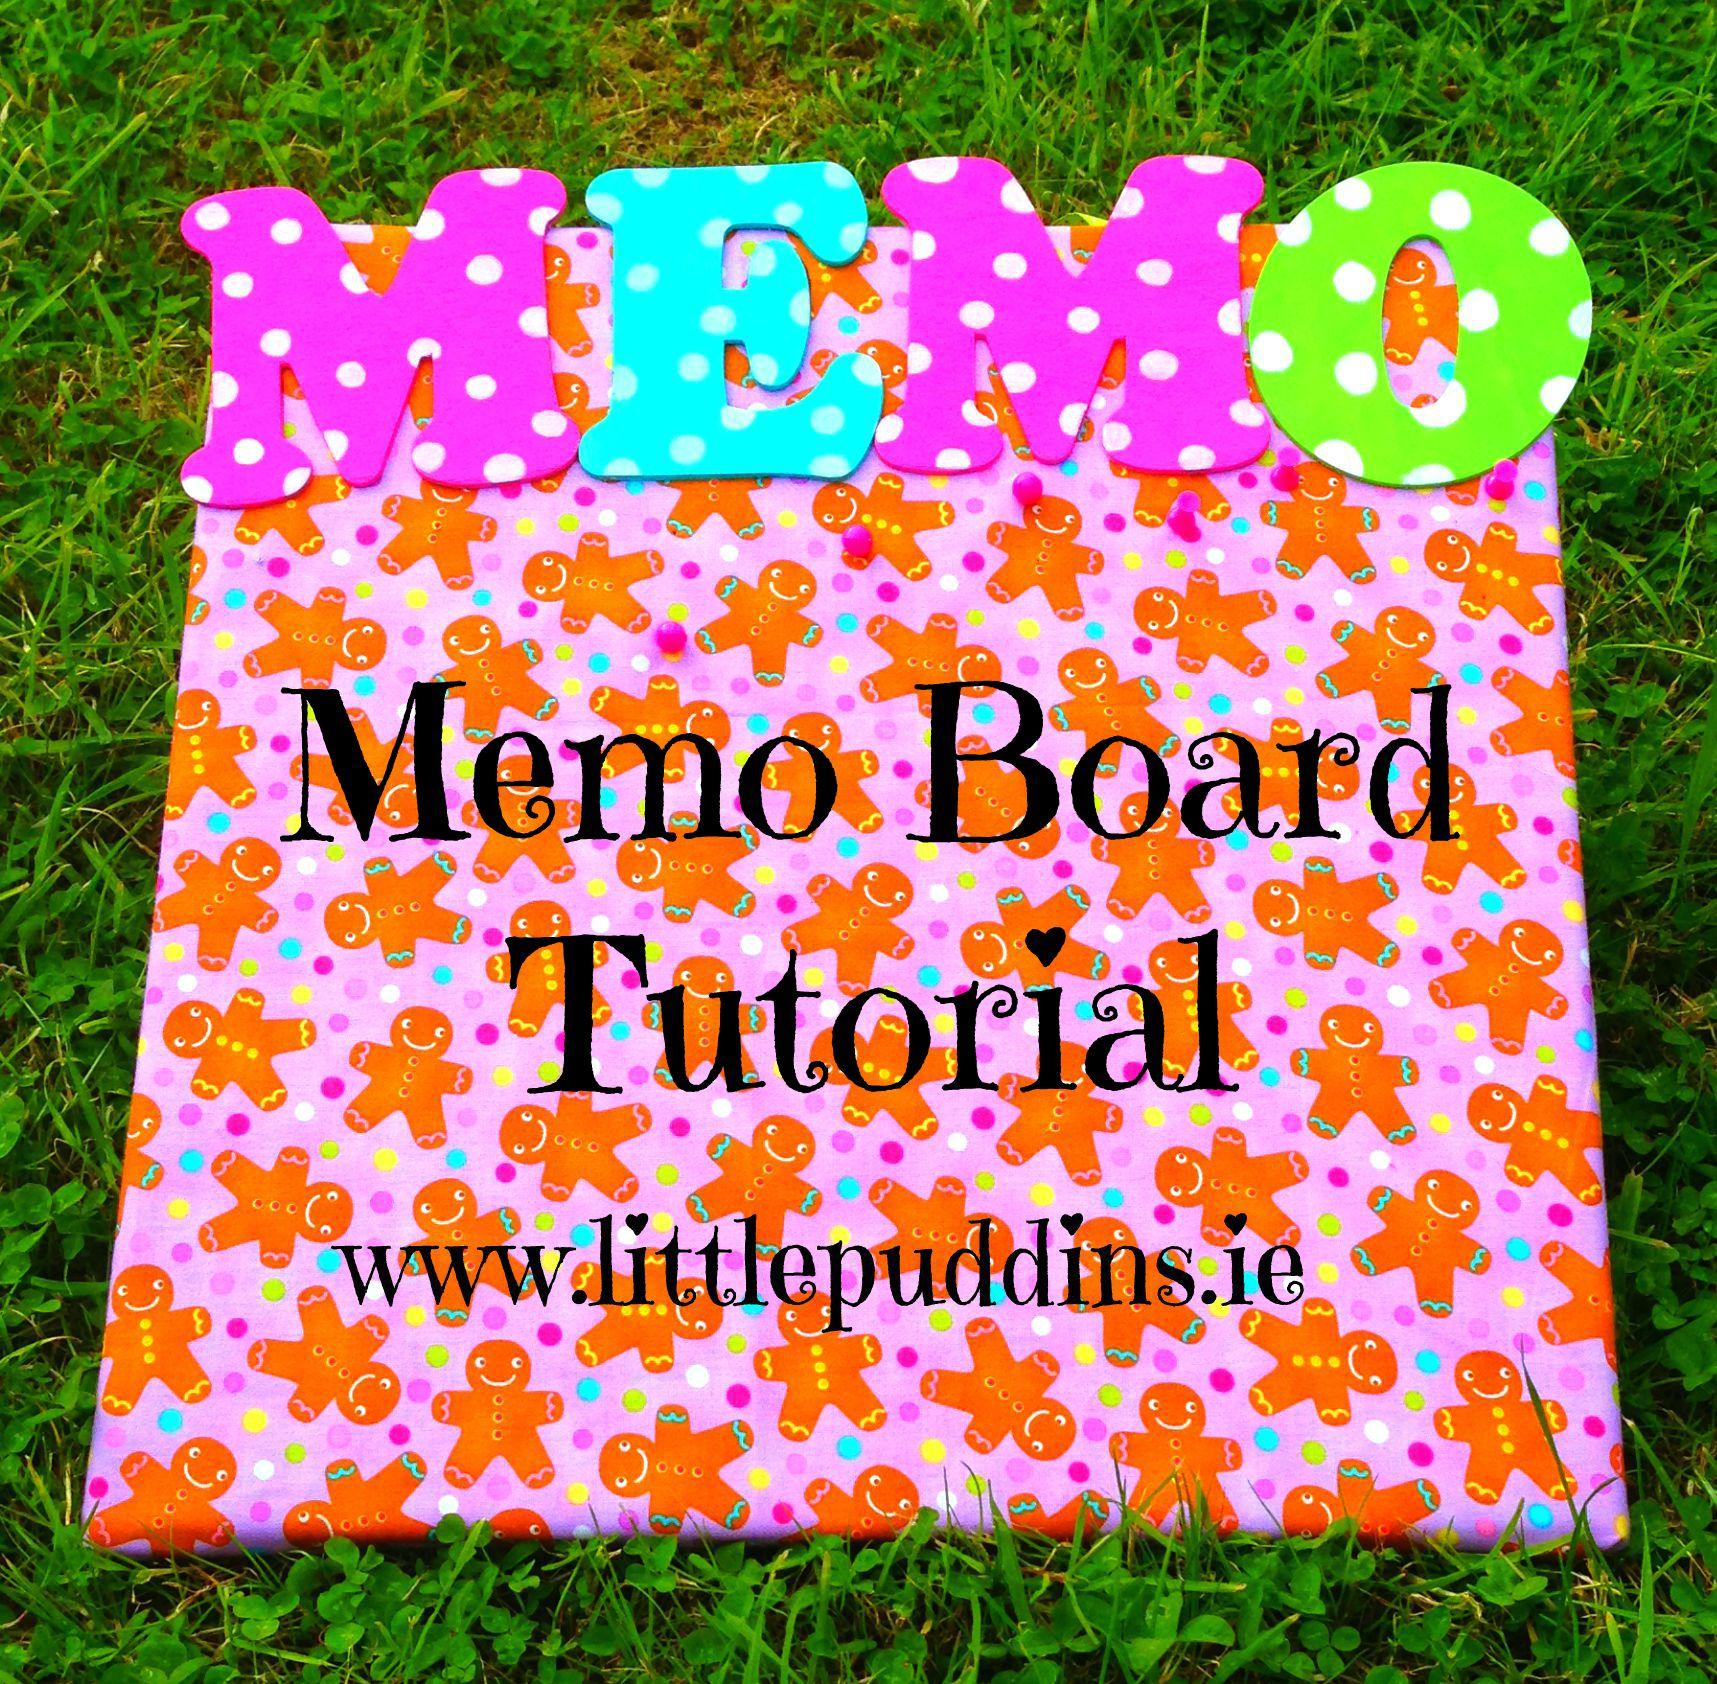 Memo Board Tutorial